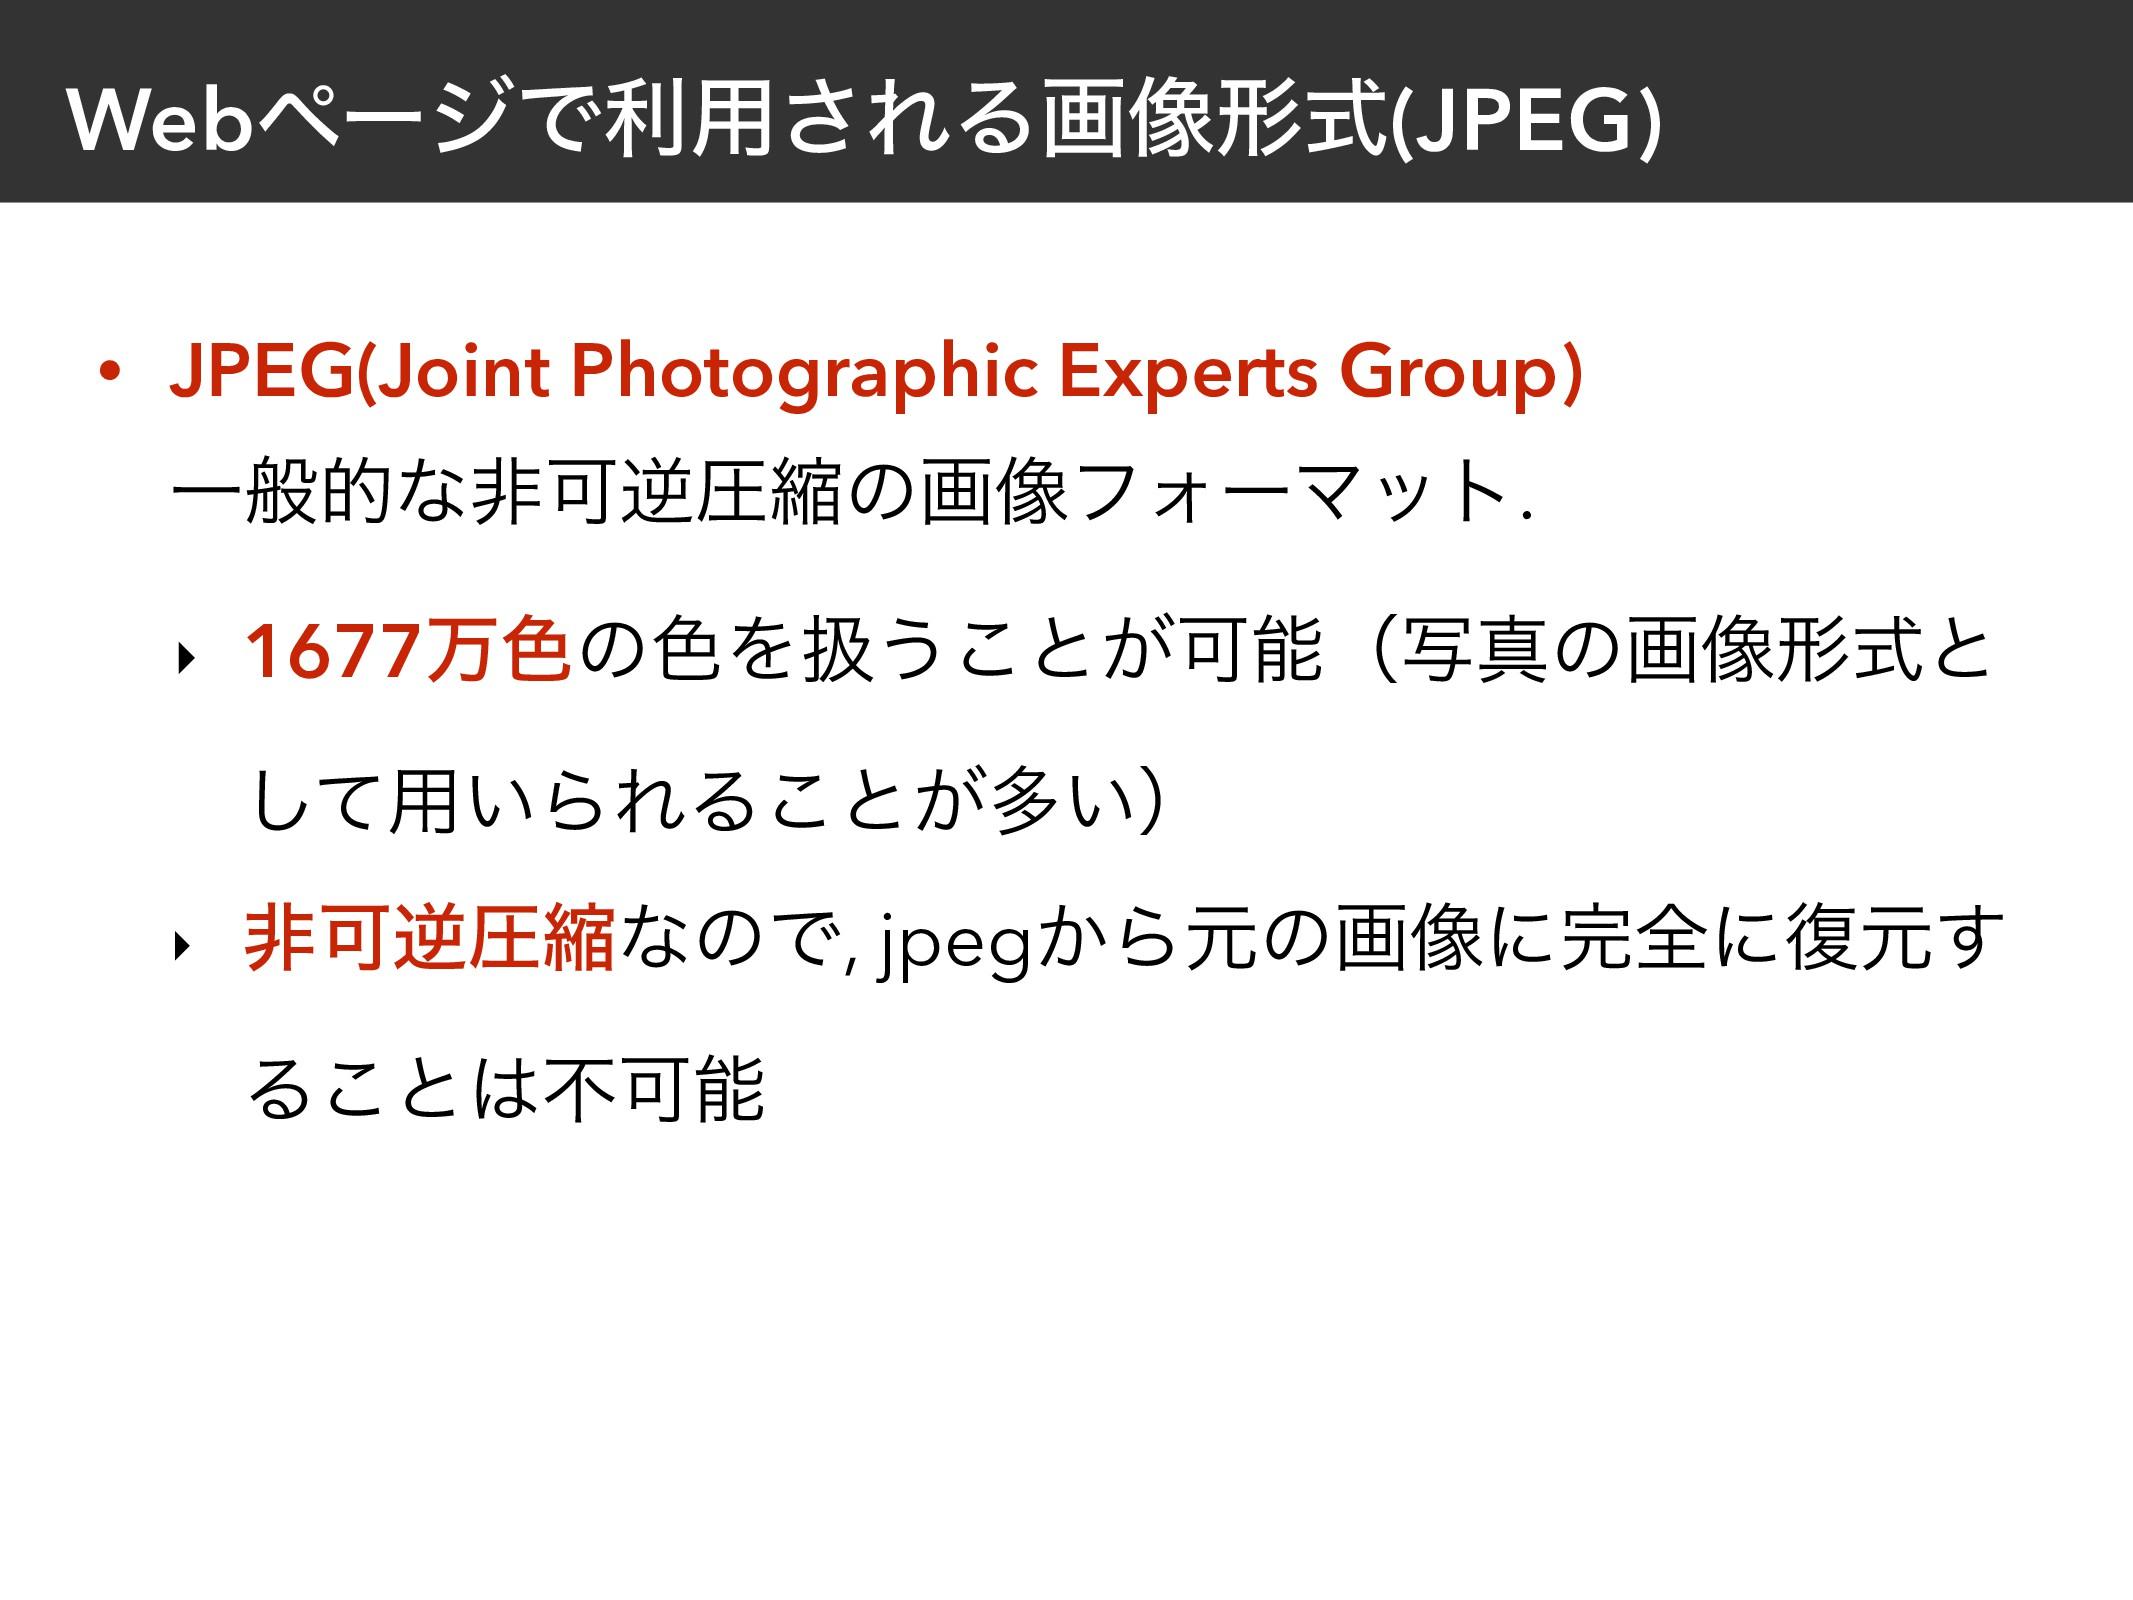 WebϖʔδͰར༻͞ΕΔը૾ܗࣜ(JPEG) • JPEG(Joint Photographi...